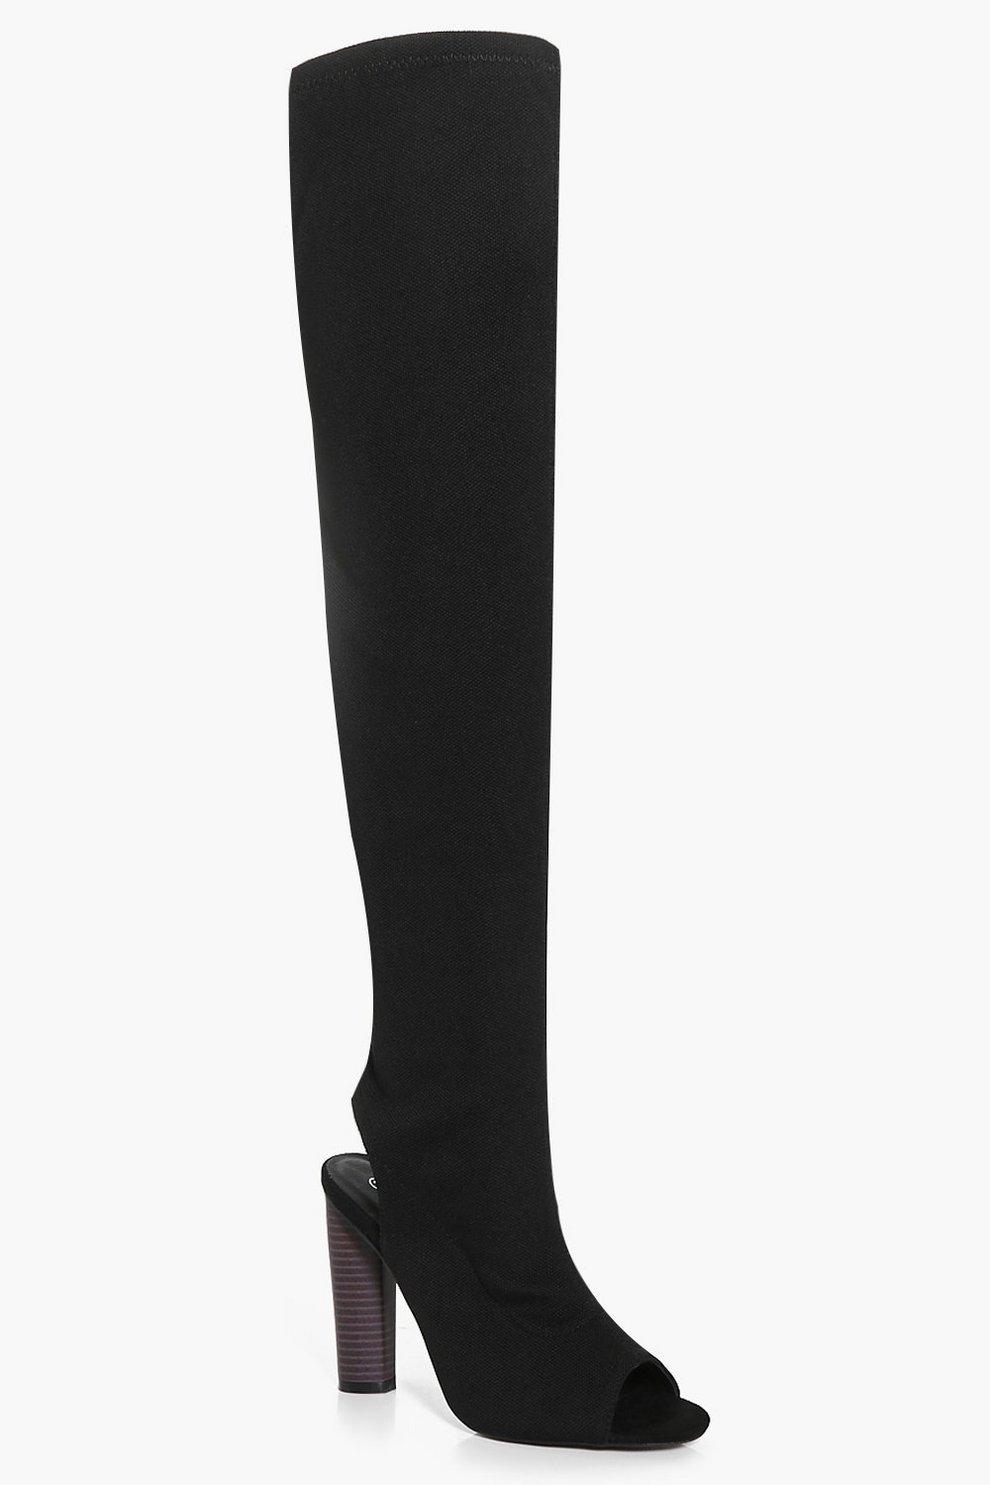 902c7fda Lena Knitted Peeptoe Over The Knee Boot